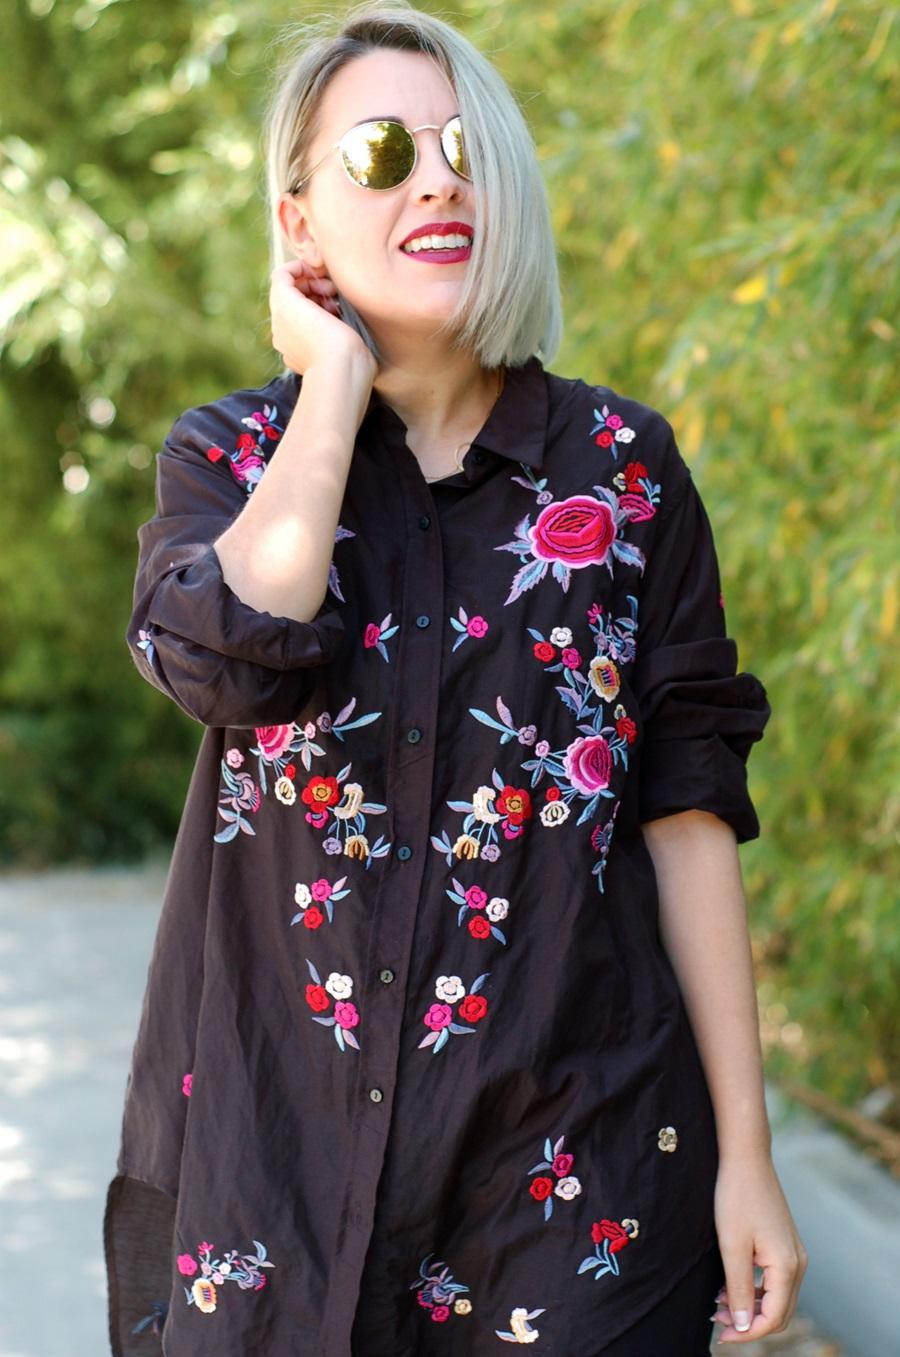 embroidered shirt Zara, granny shoes Pimkie sunnies Cheapass littledreamsbyr